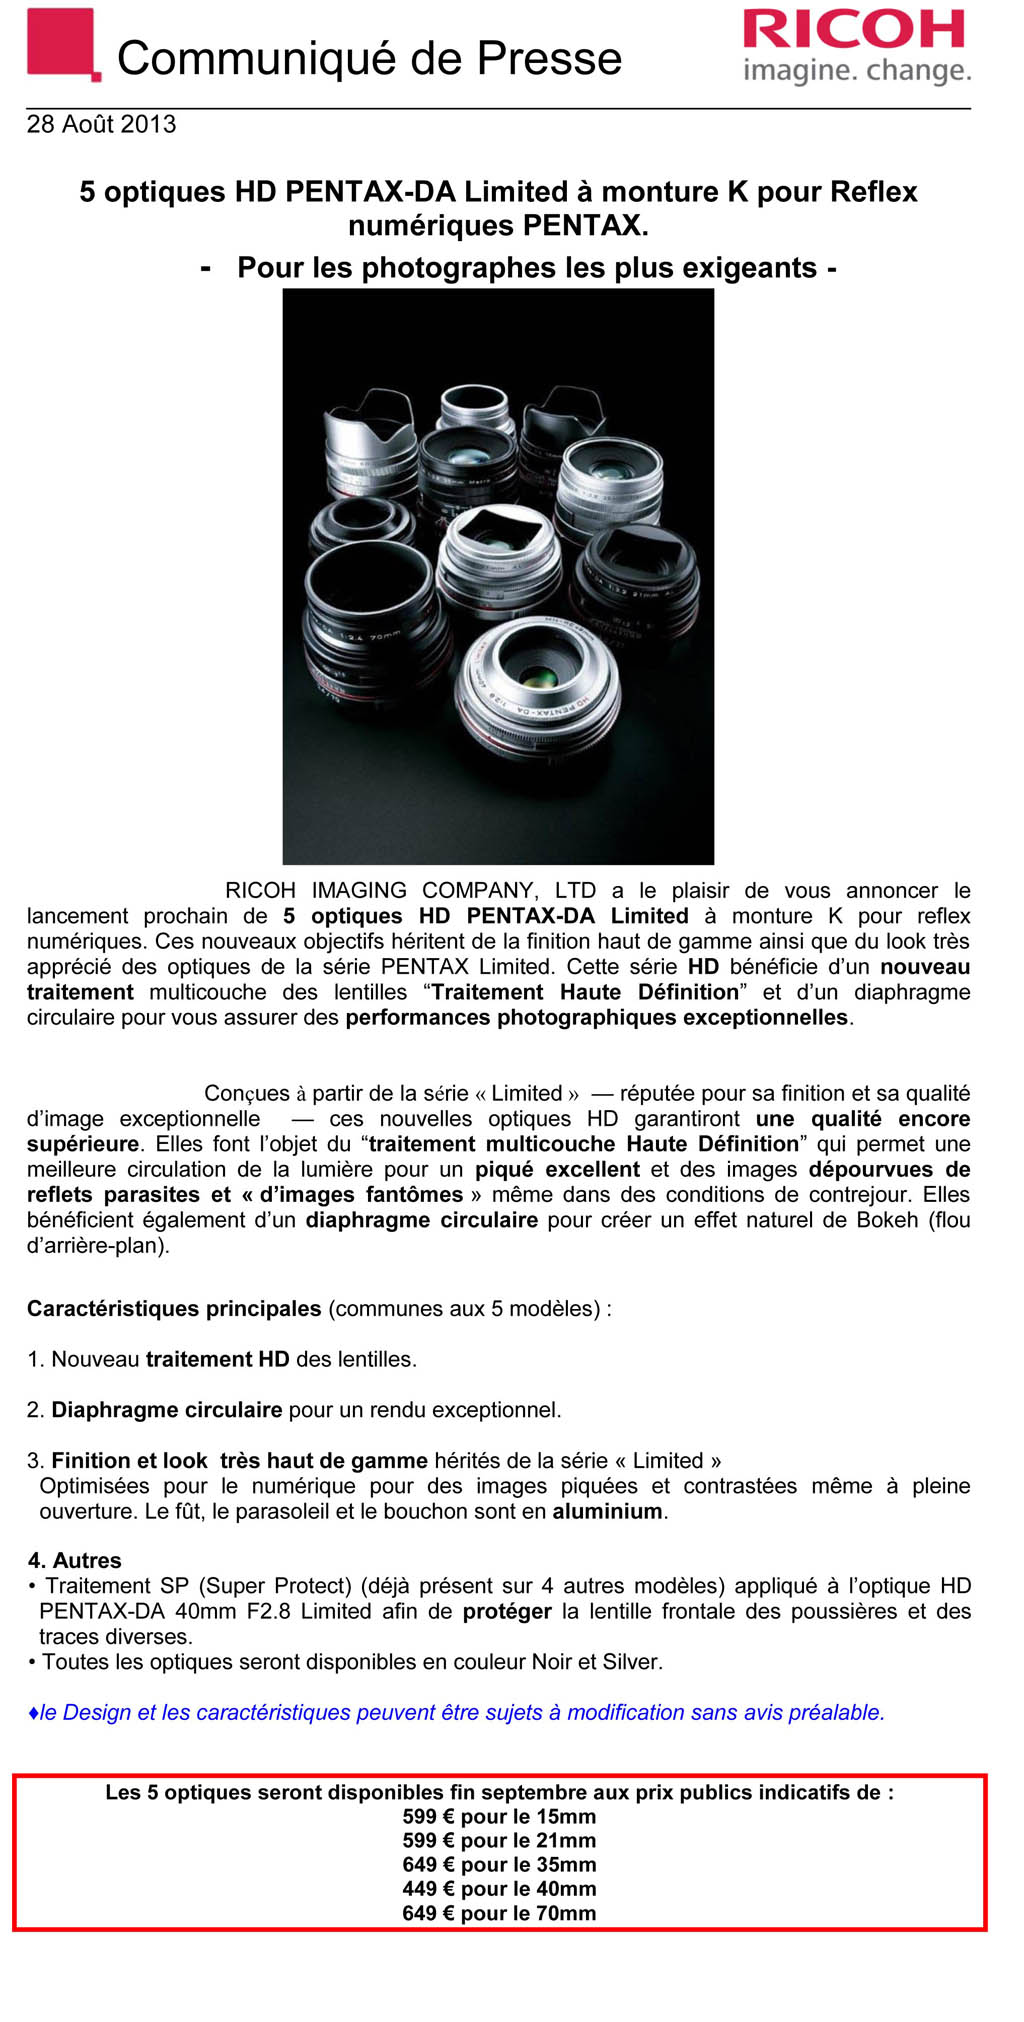 PENTAX RICOH IMAGING - Communiqué de Presse 28/08/2013 - 5 optiques HD Pentax DA Ltd Li56